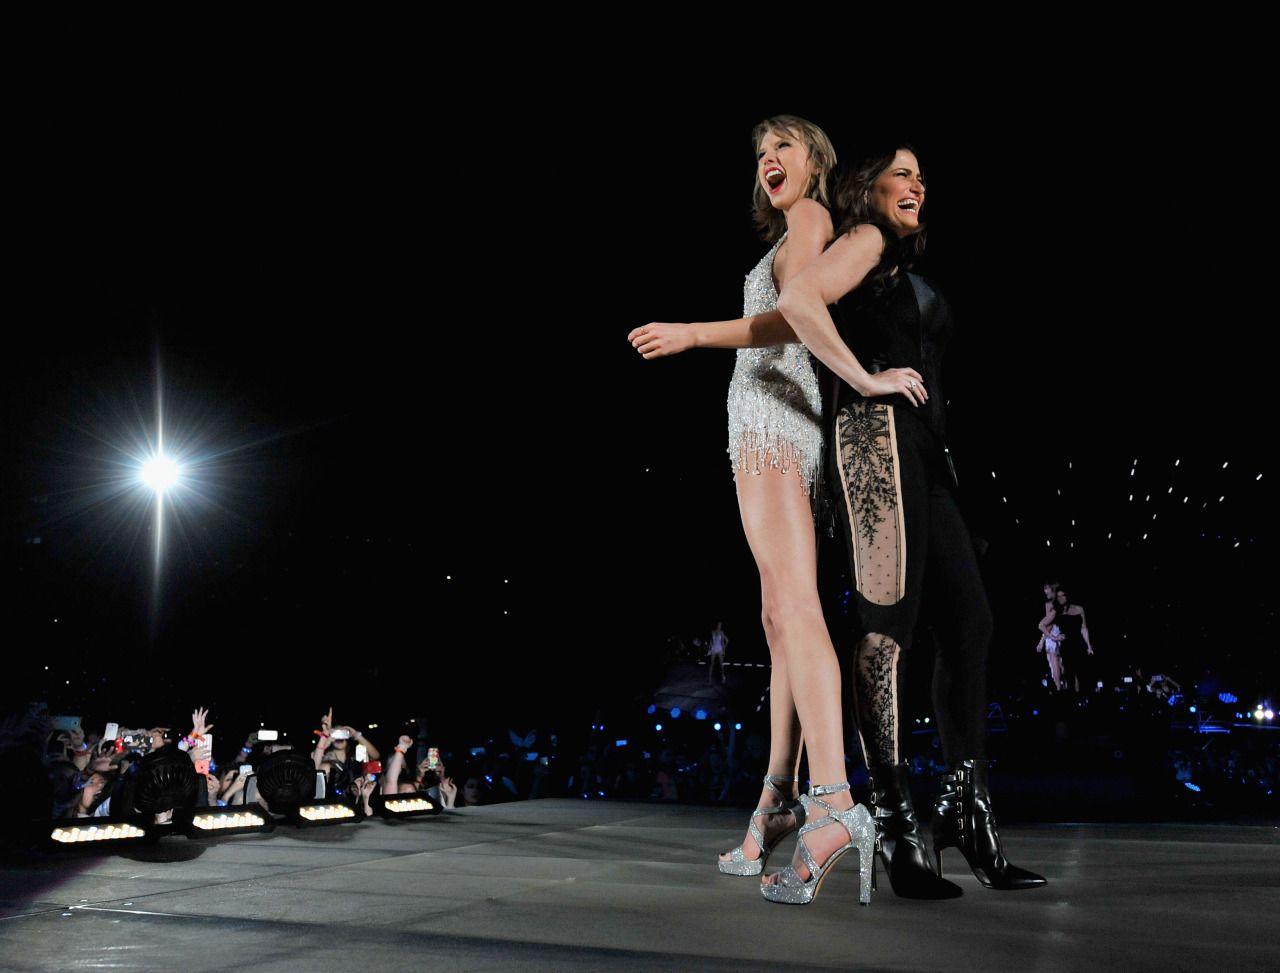 Taylor Swift and Idina Menzel // 1989 Tour Tampa